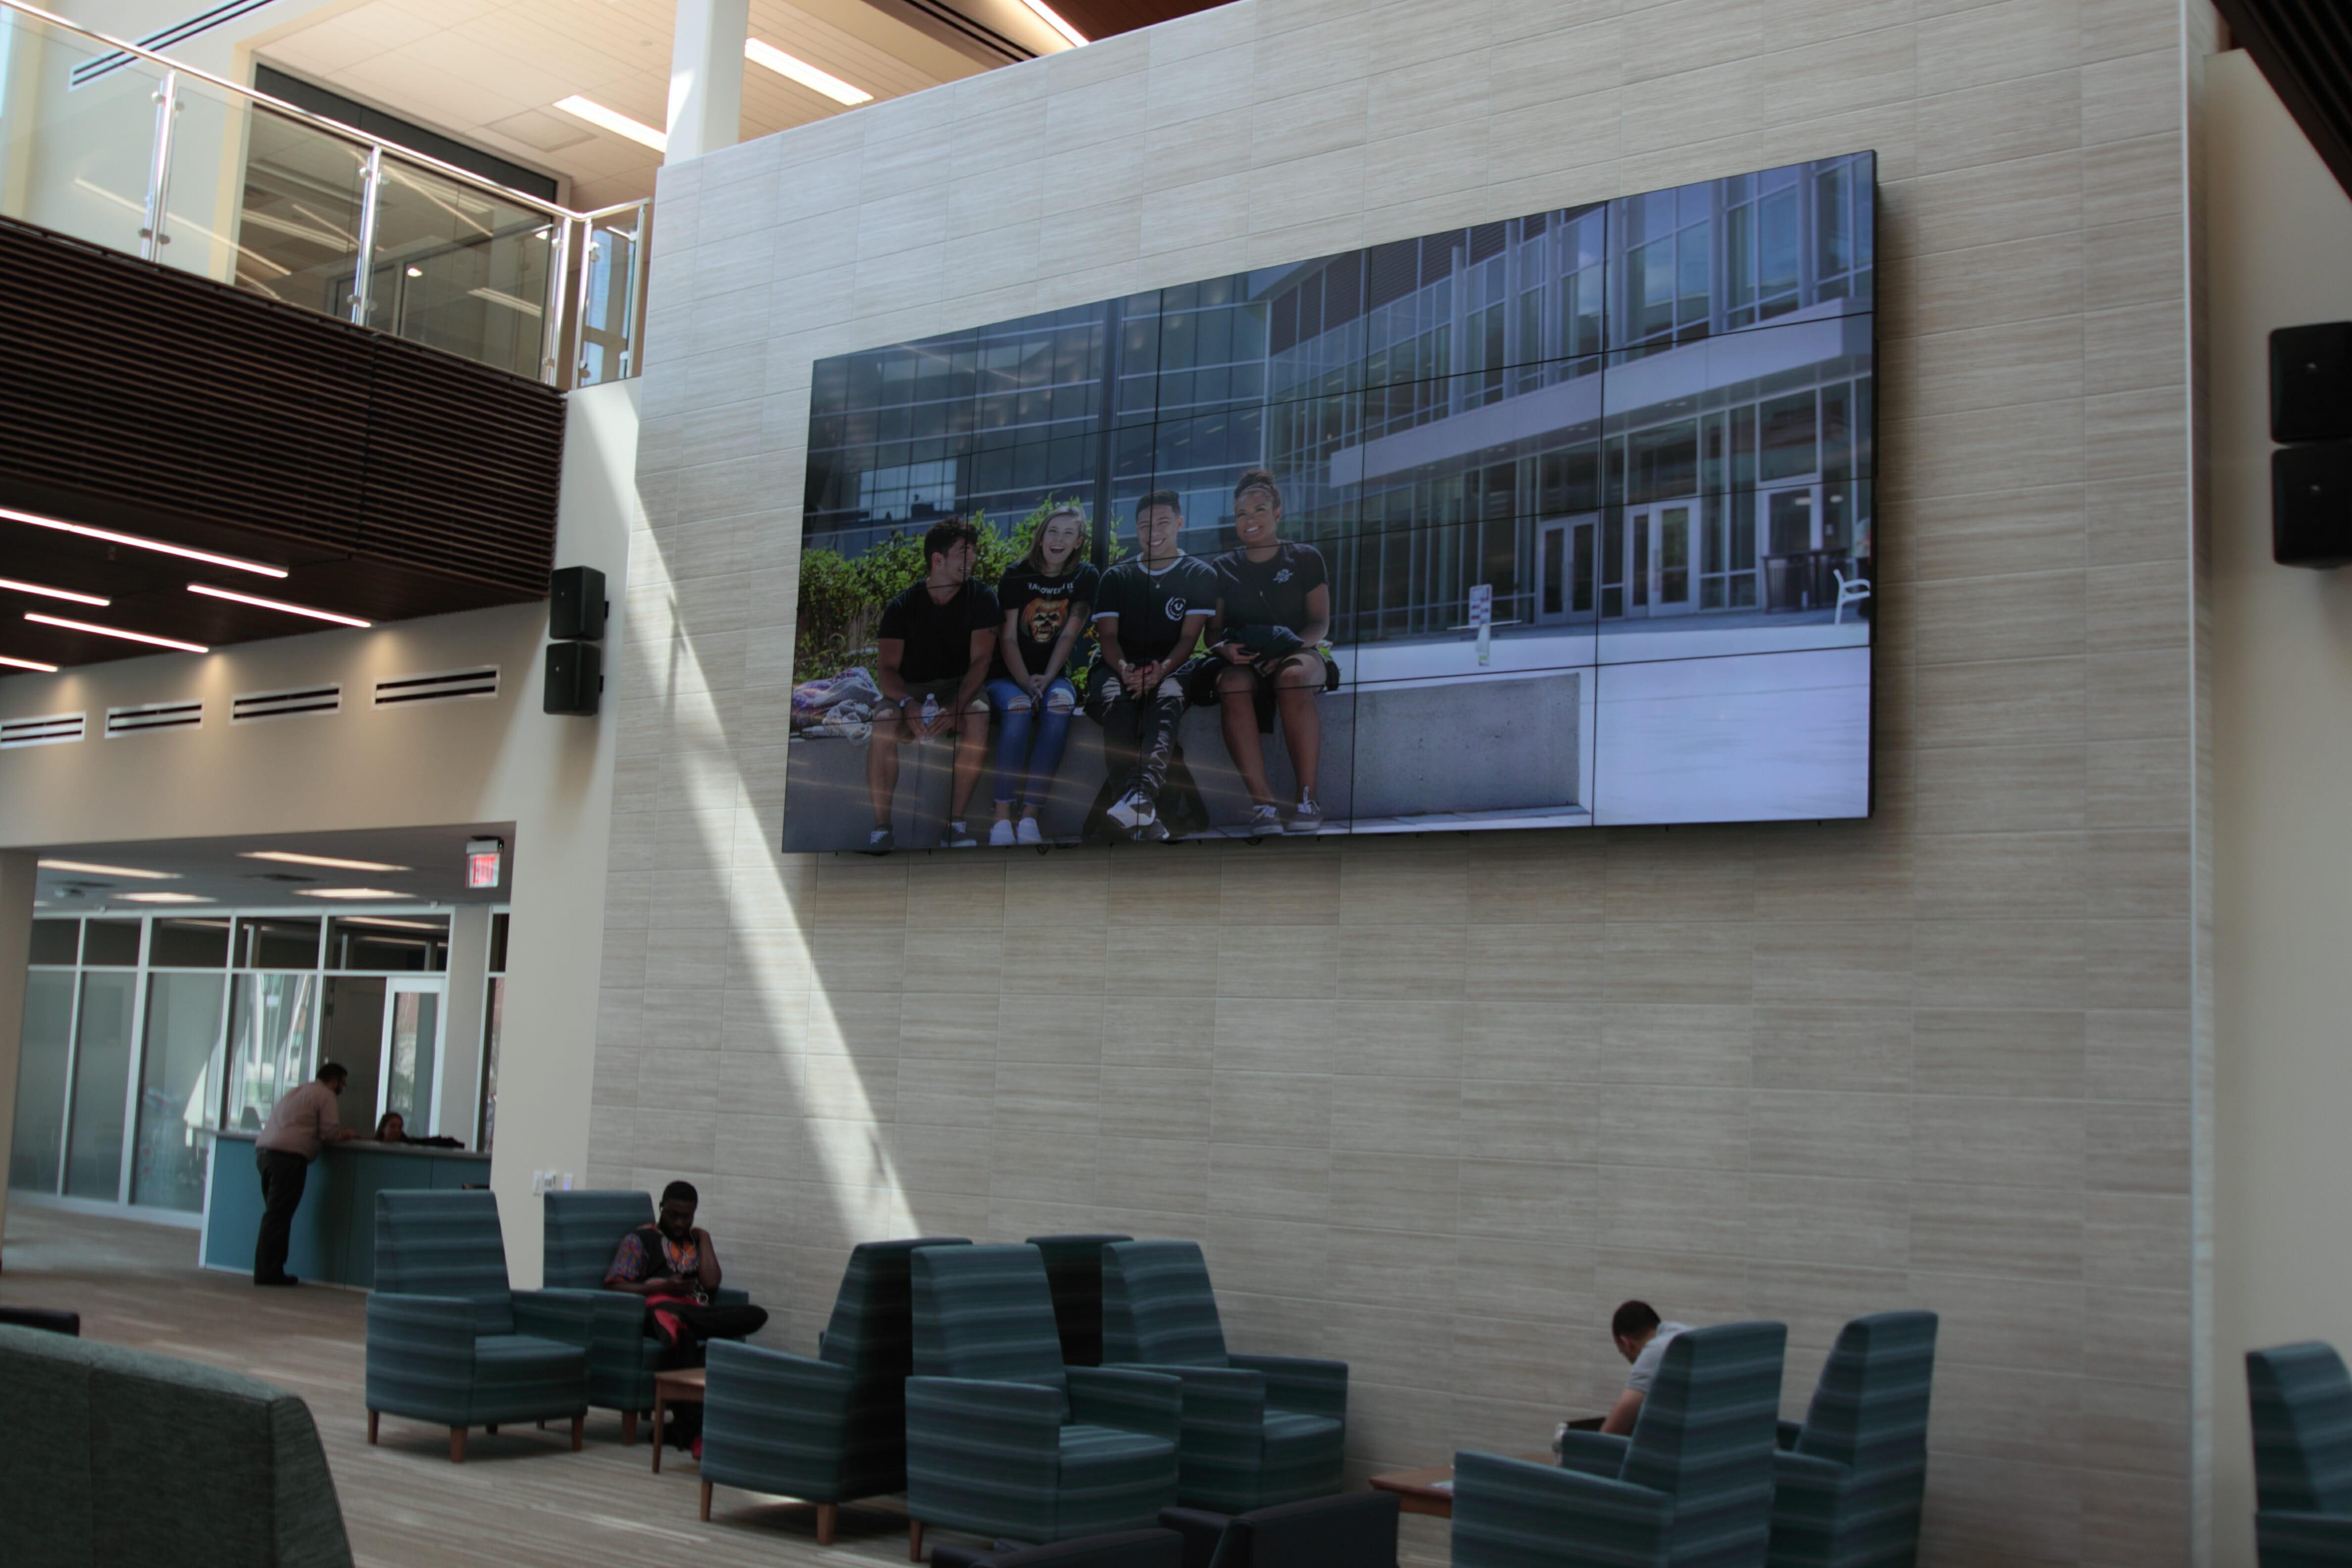 csav systems video wall